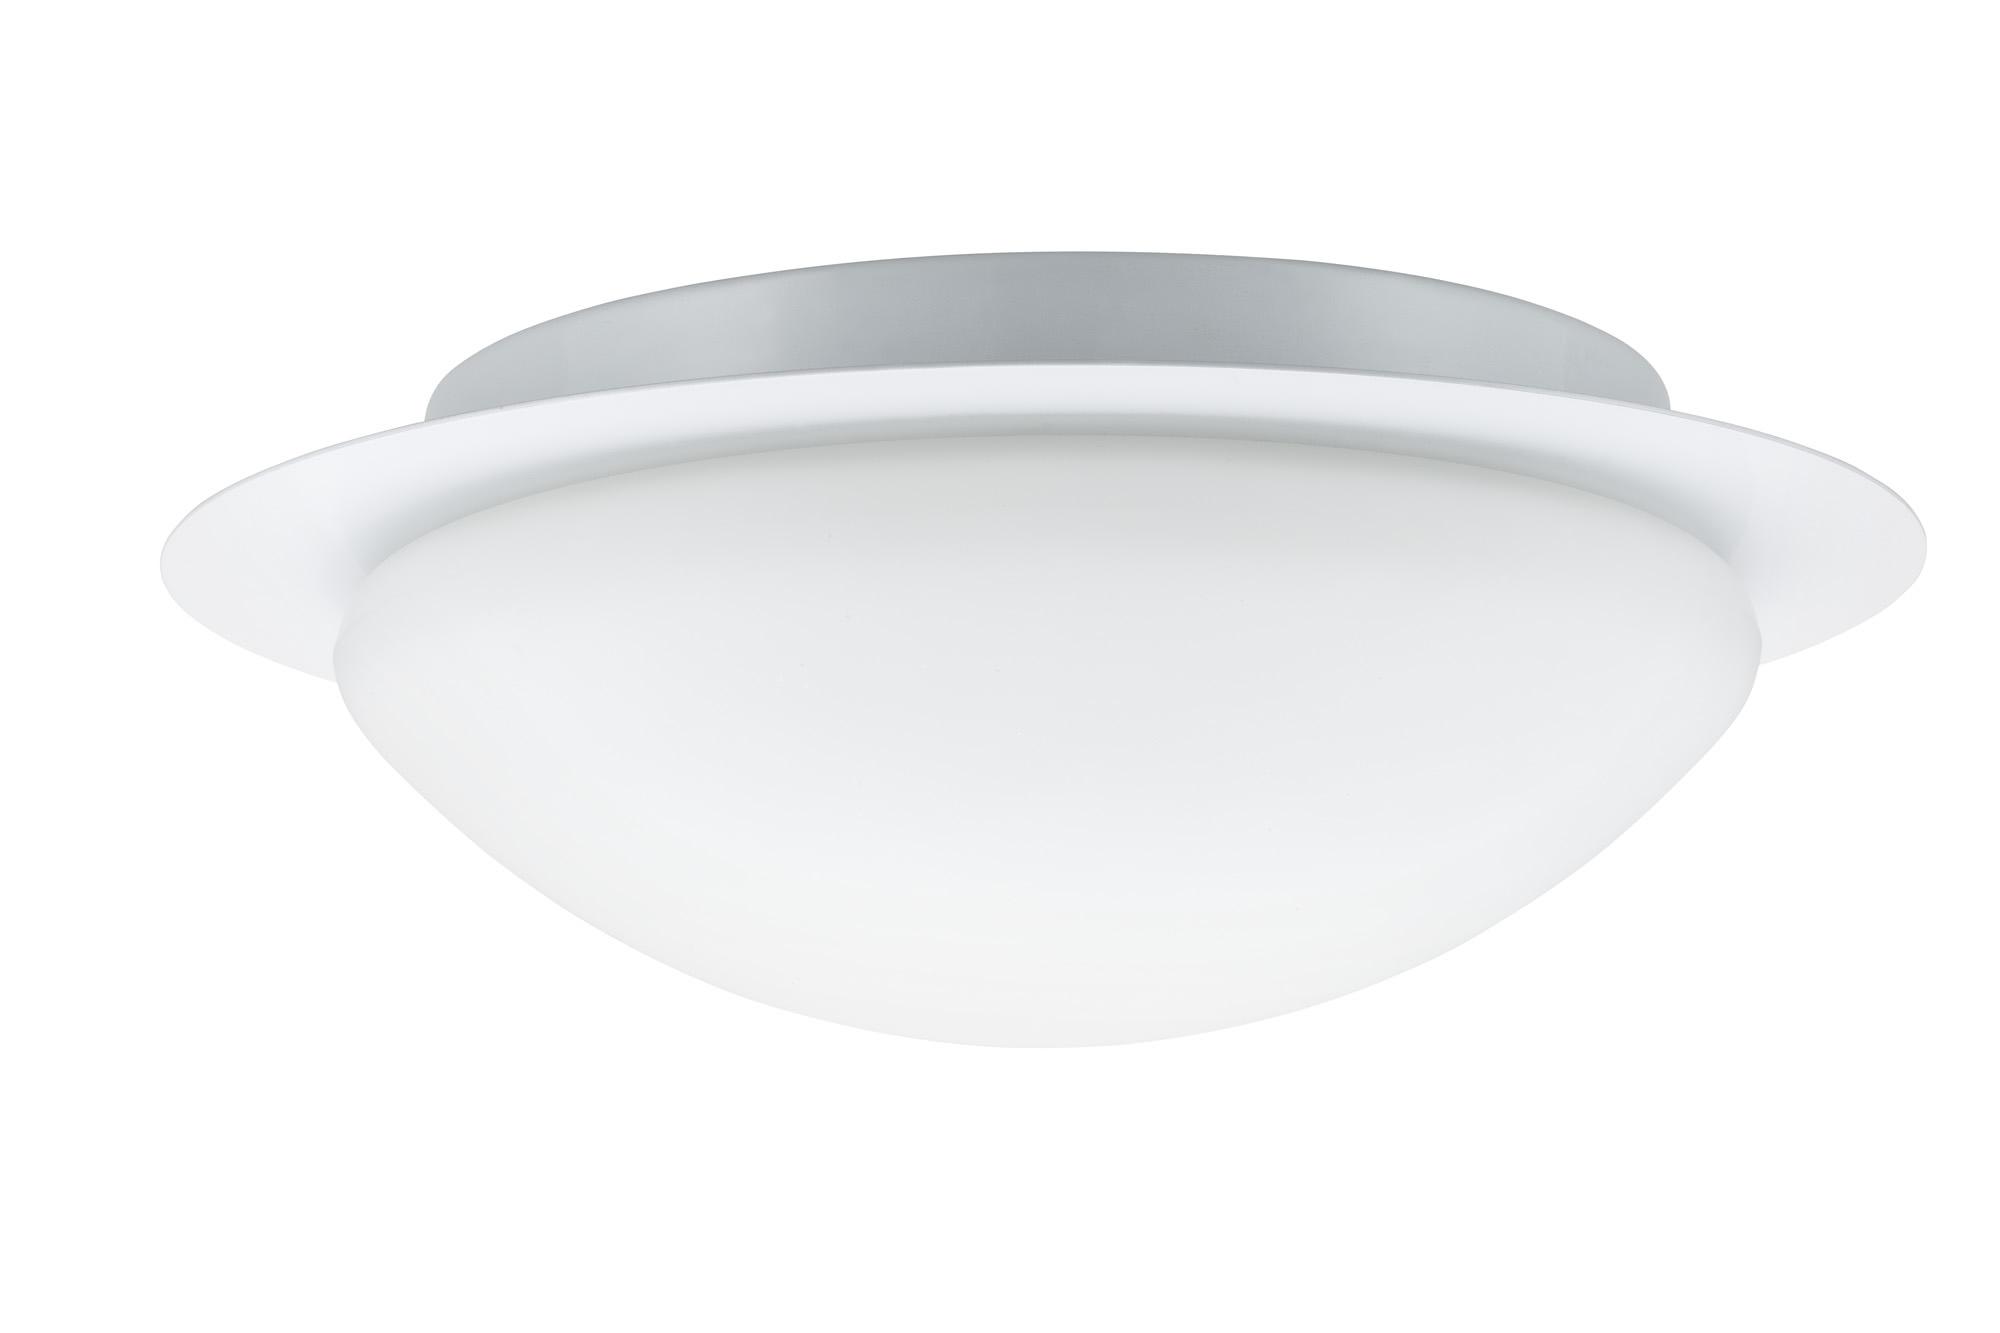 Paulmann. 70347 Светильник настенно-потолочный 1x60W W-D Vega 230V E27 Белый/Опал